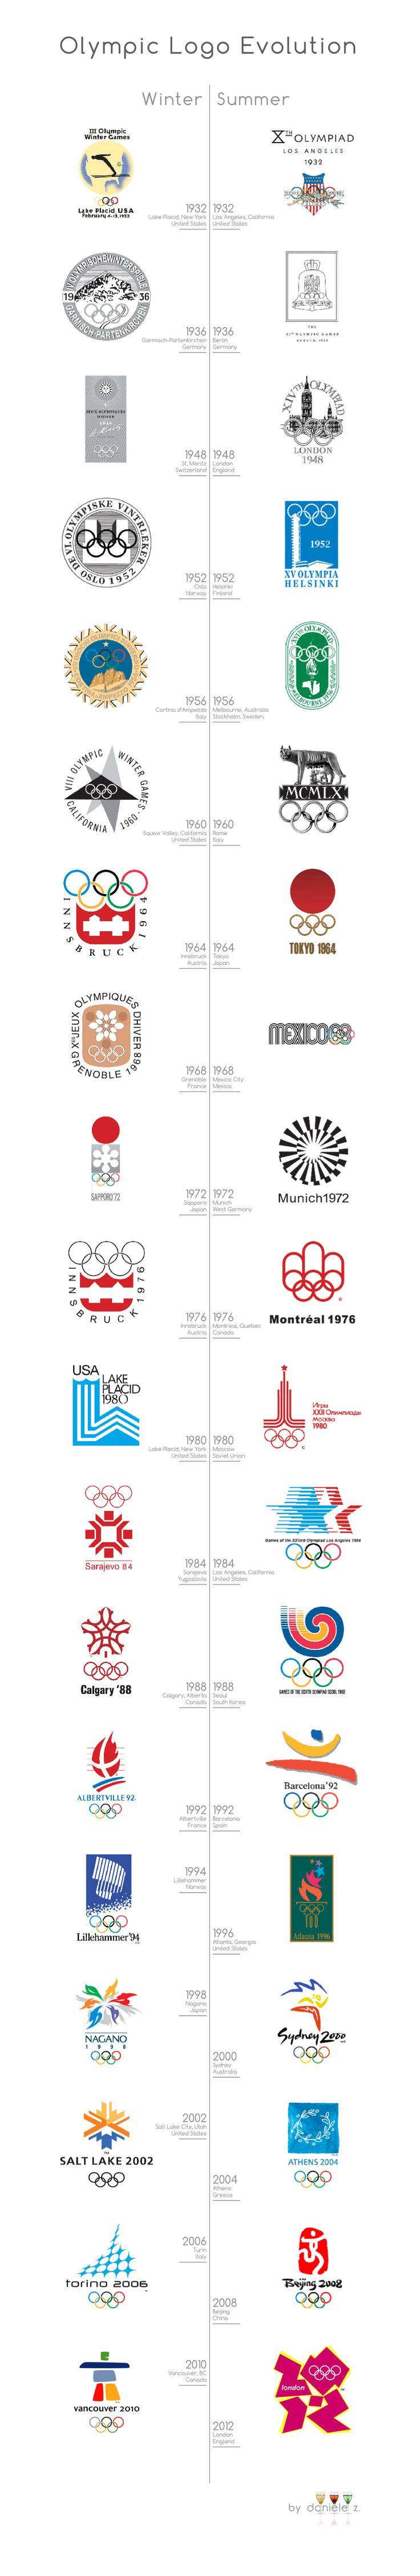 Olympic Logo Evolution